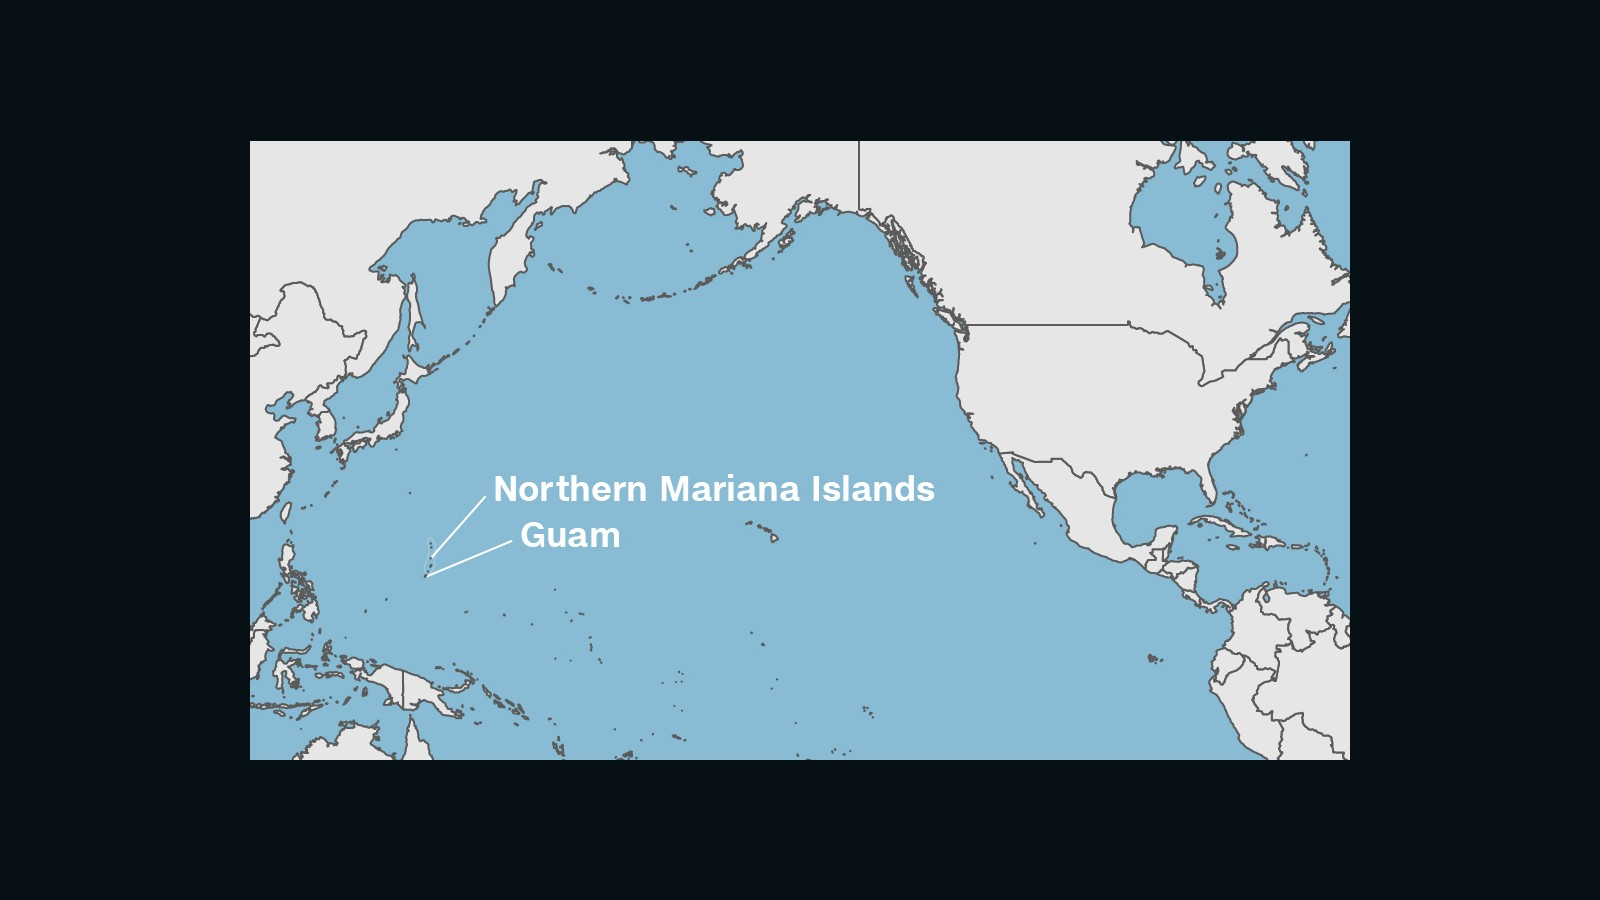 Guam World Map. Elegant Guam World Map Where Is Guam Located On The ...